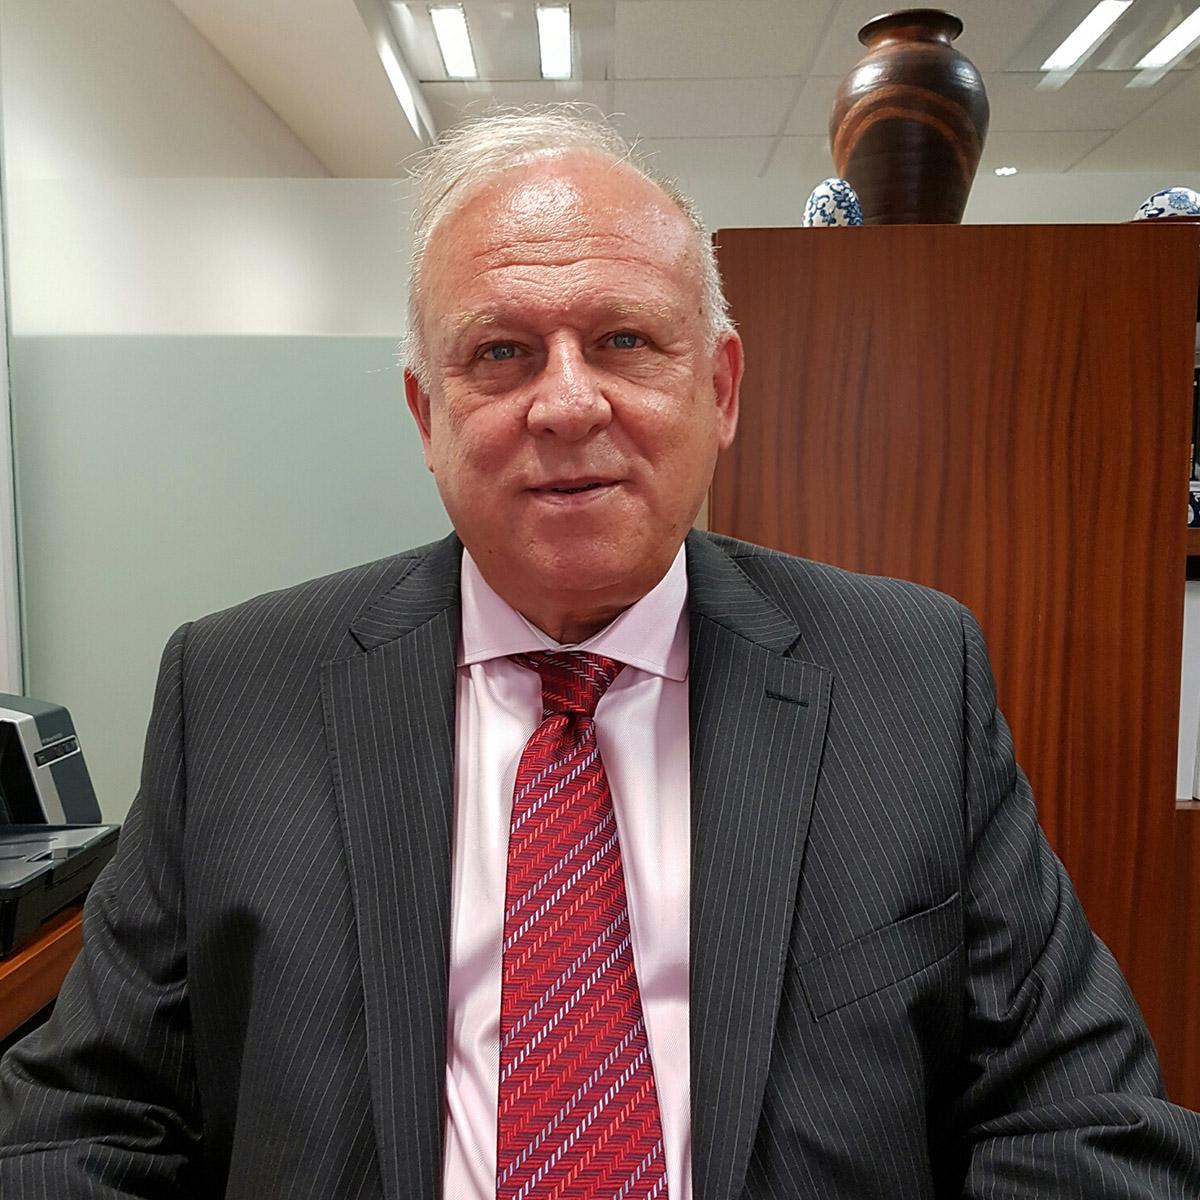 Jorge Bertero